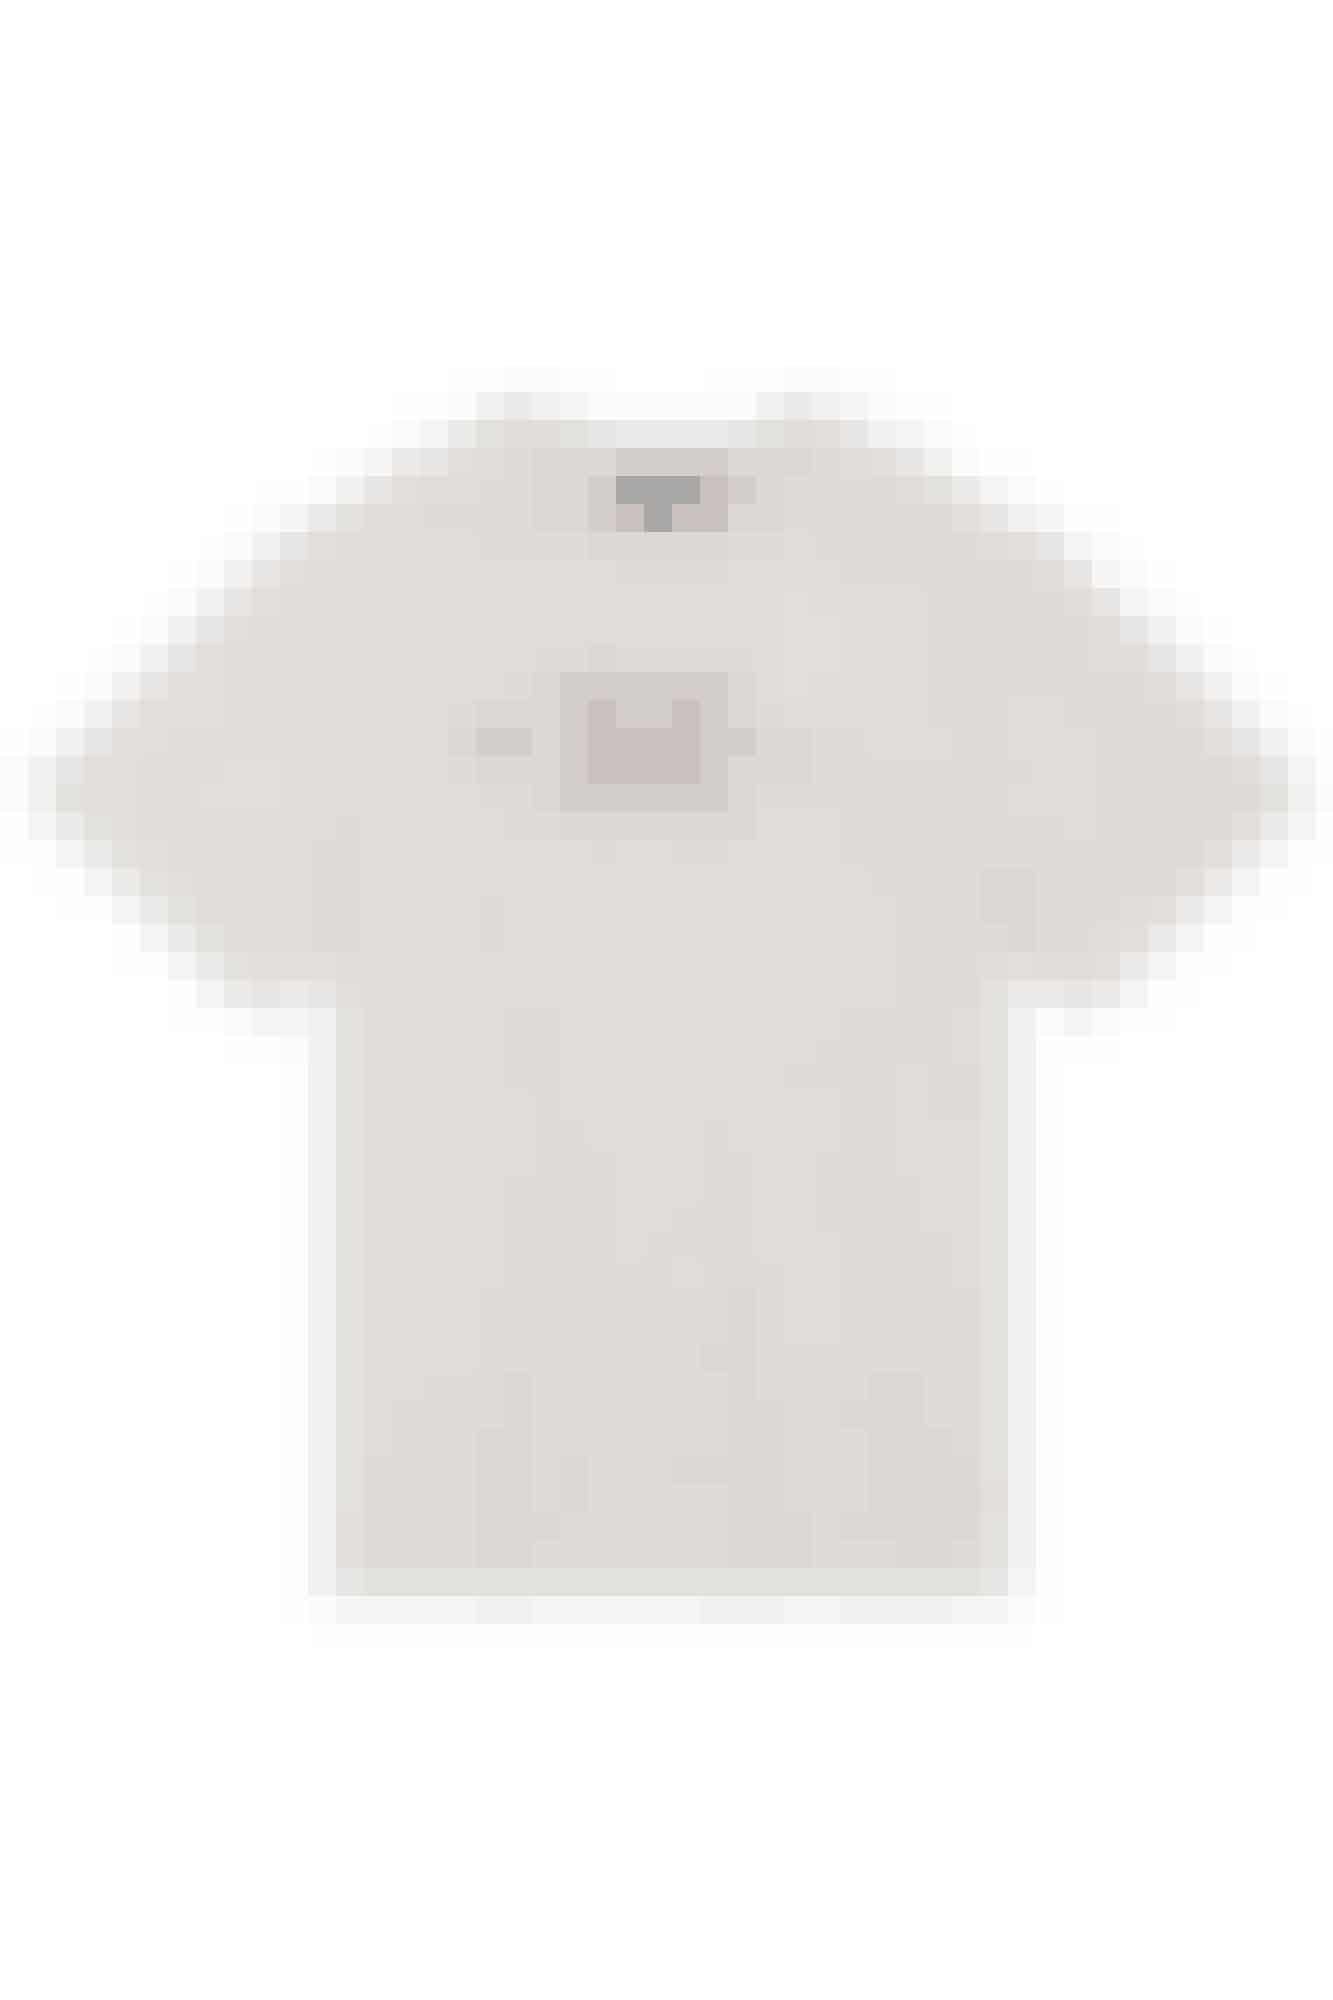 T-shirt, Han Kjøbenhavn hos samsoe.com, 800 kr.Køb HER.